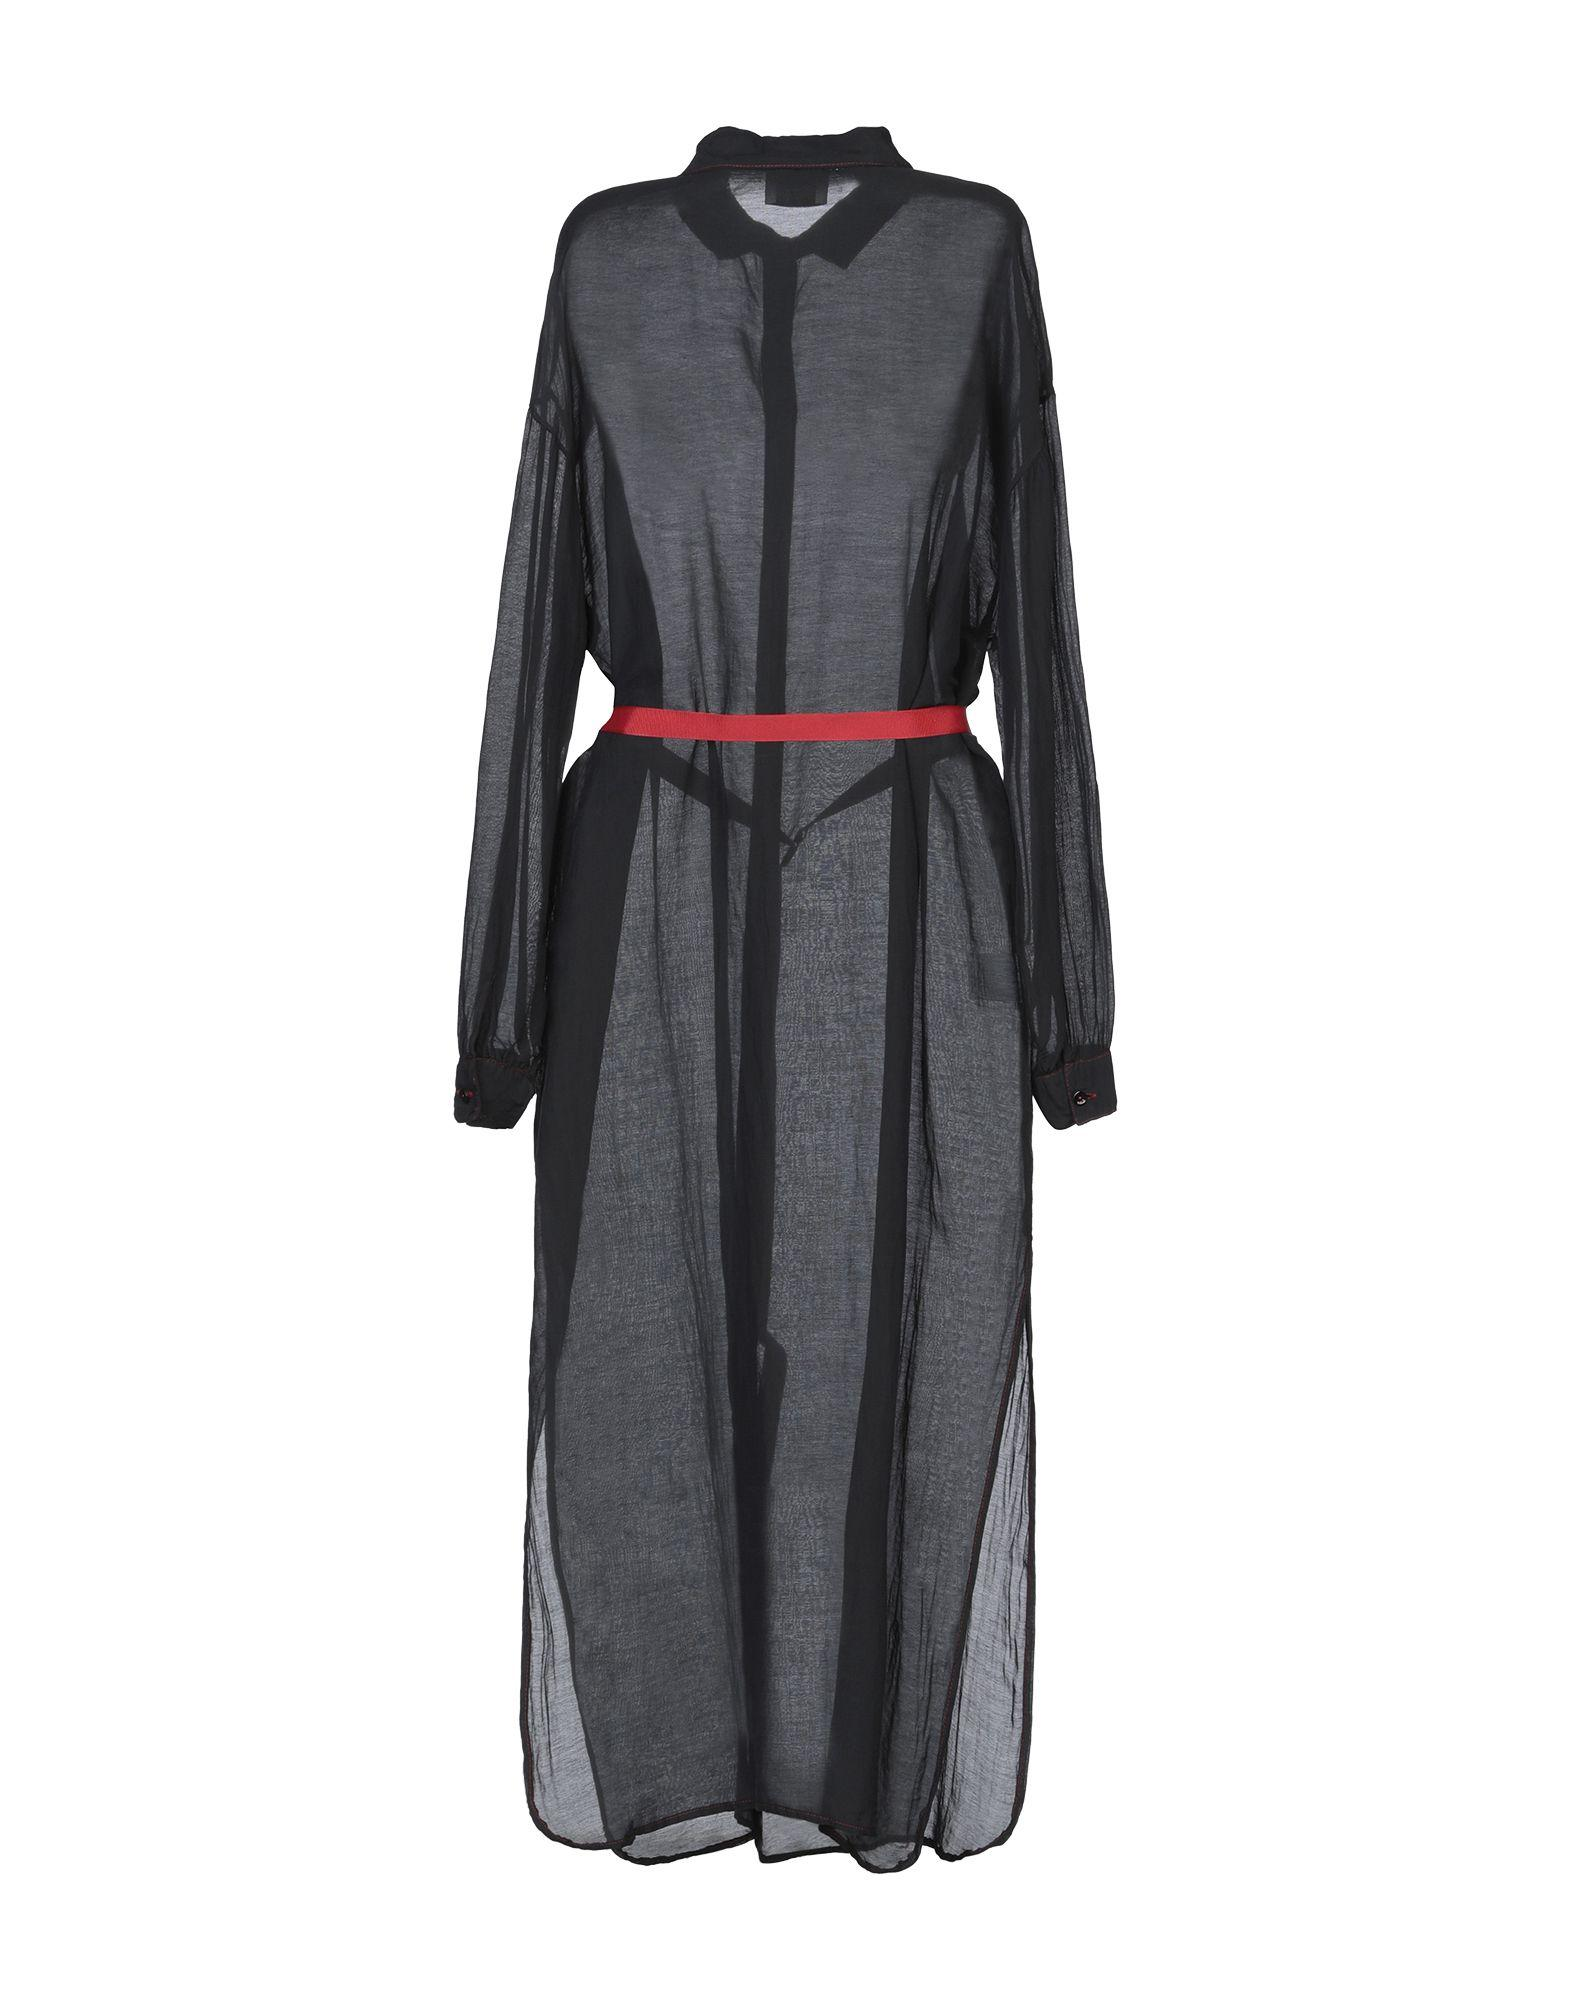 Robe mi-longue Coton ..,merci en coloris Noir